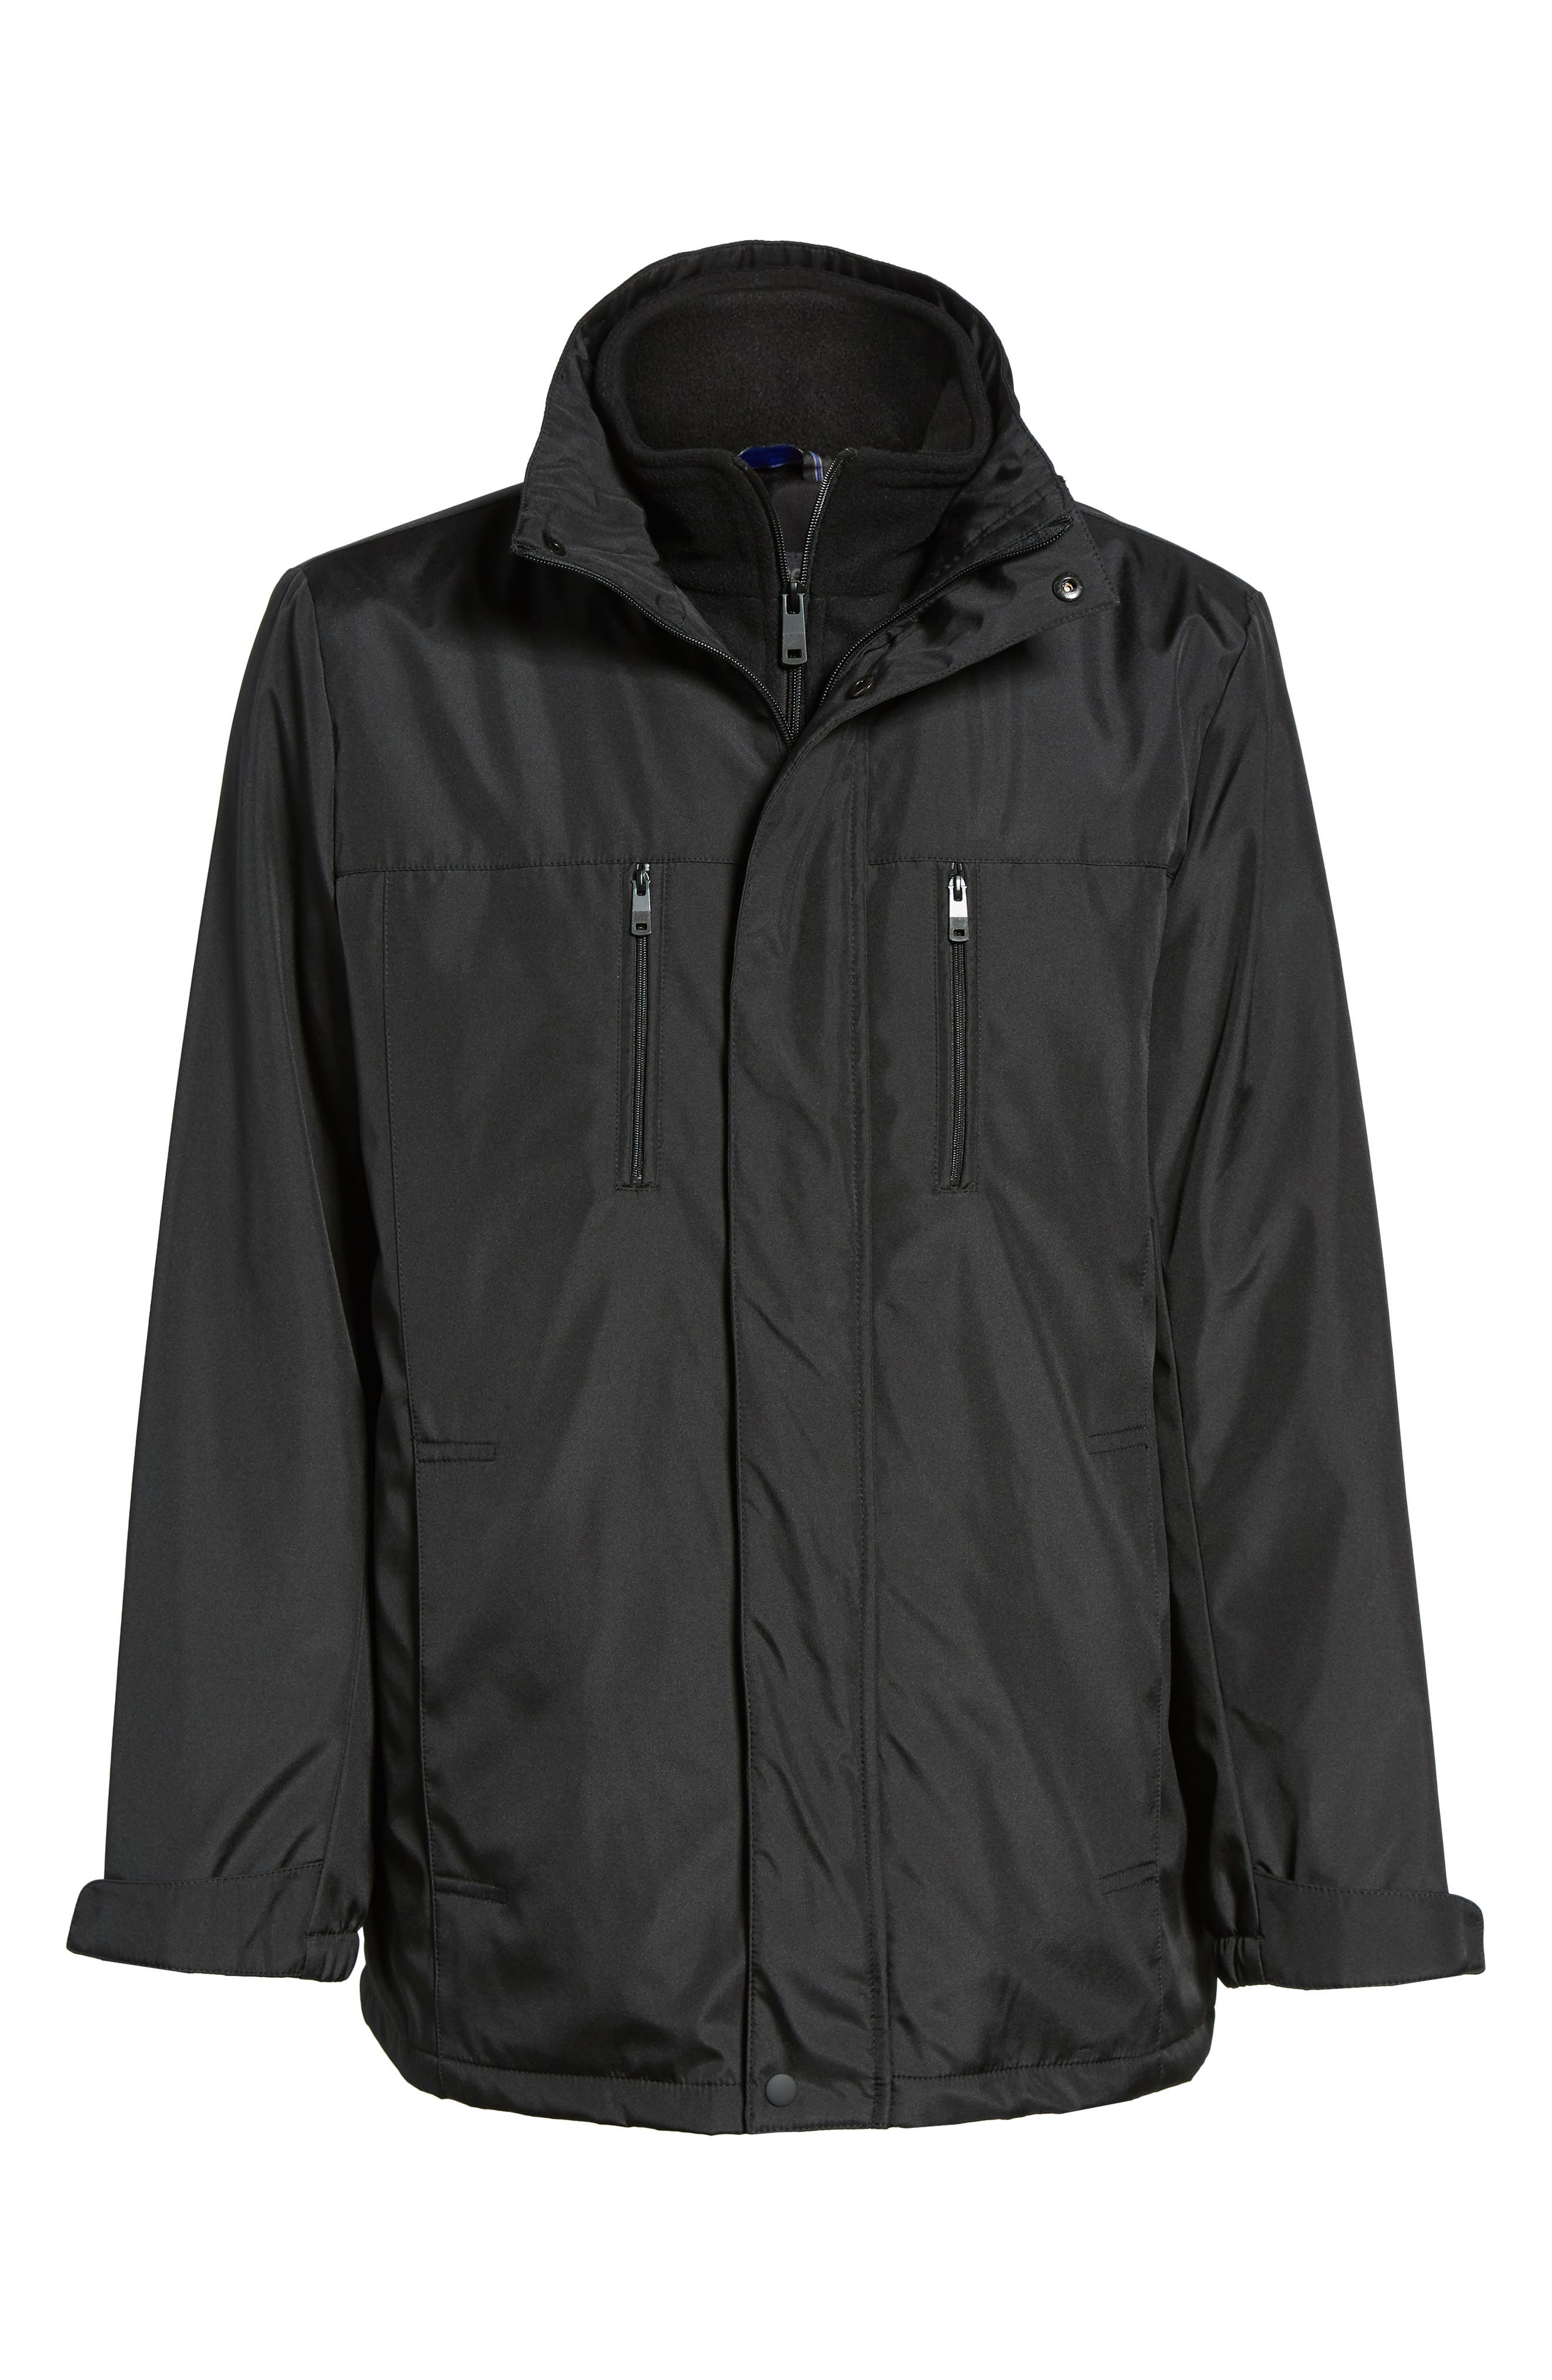 Hooded Jacket with Inset Fleece Bib,                             Alternate thumbnail 5, color,                             001